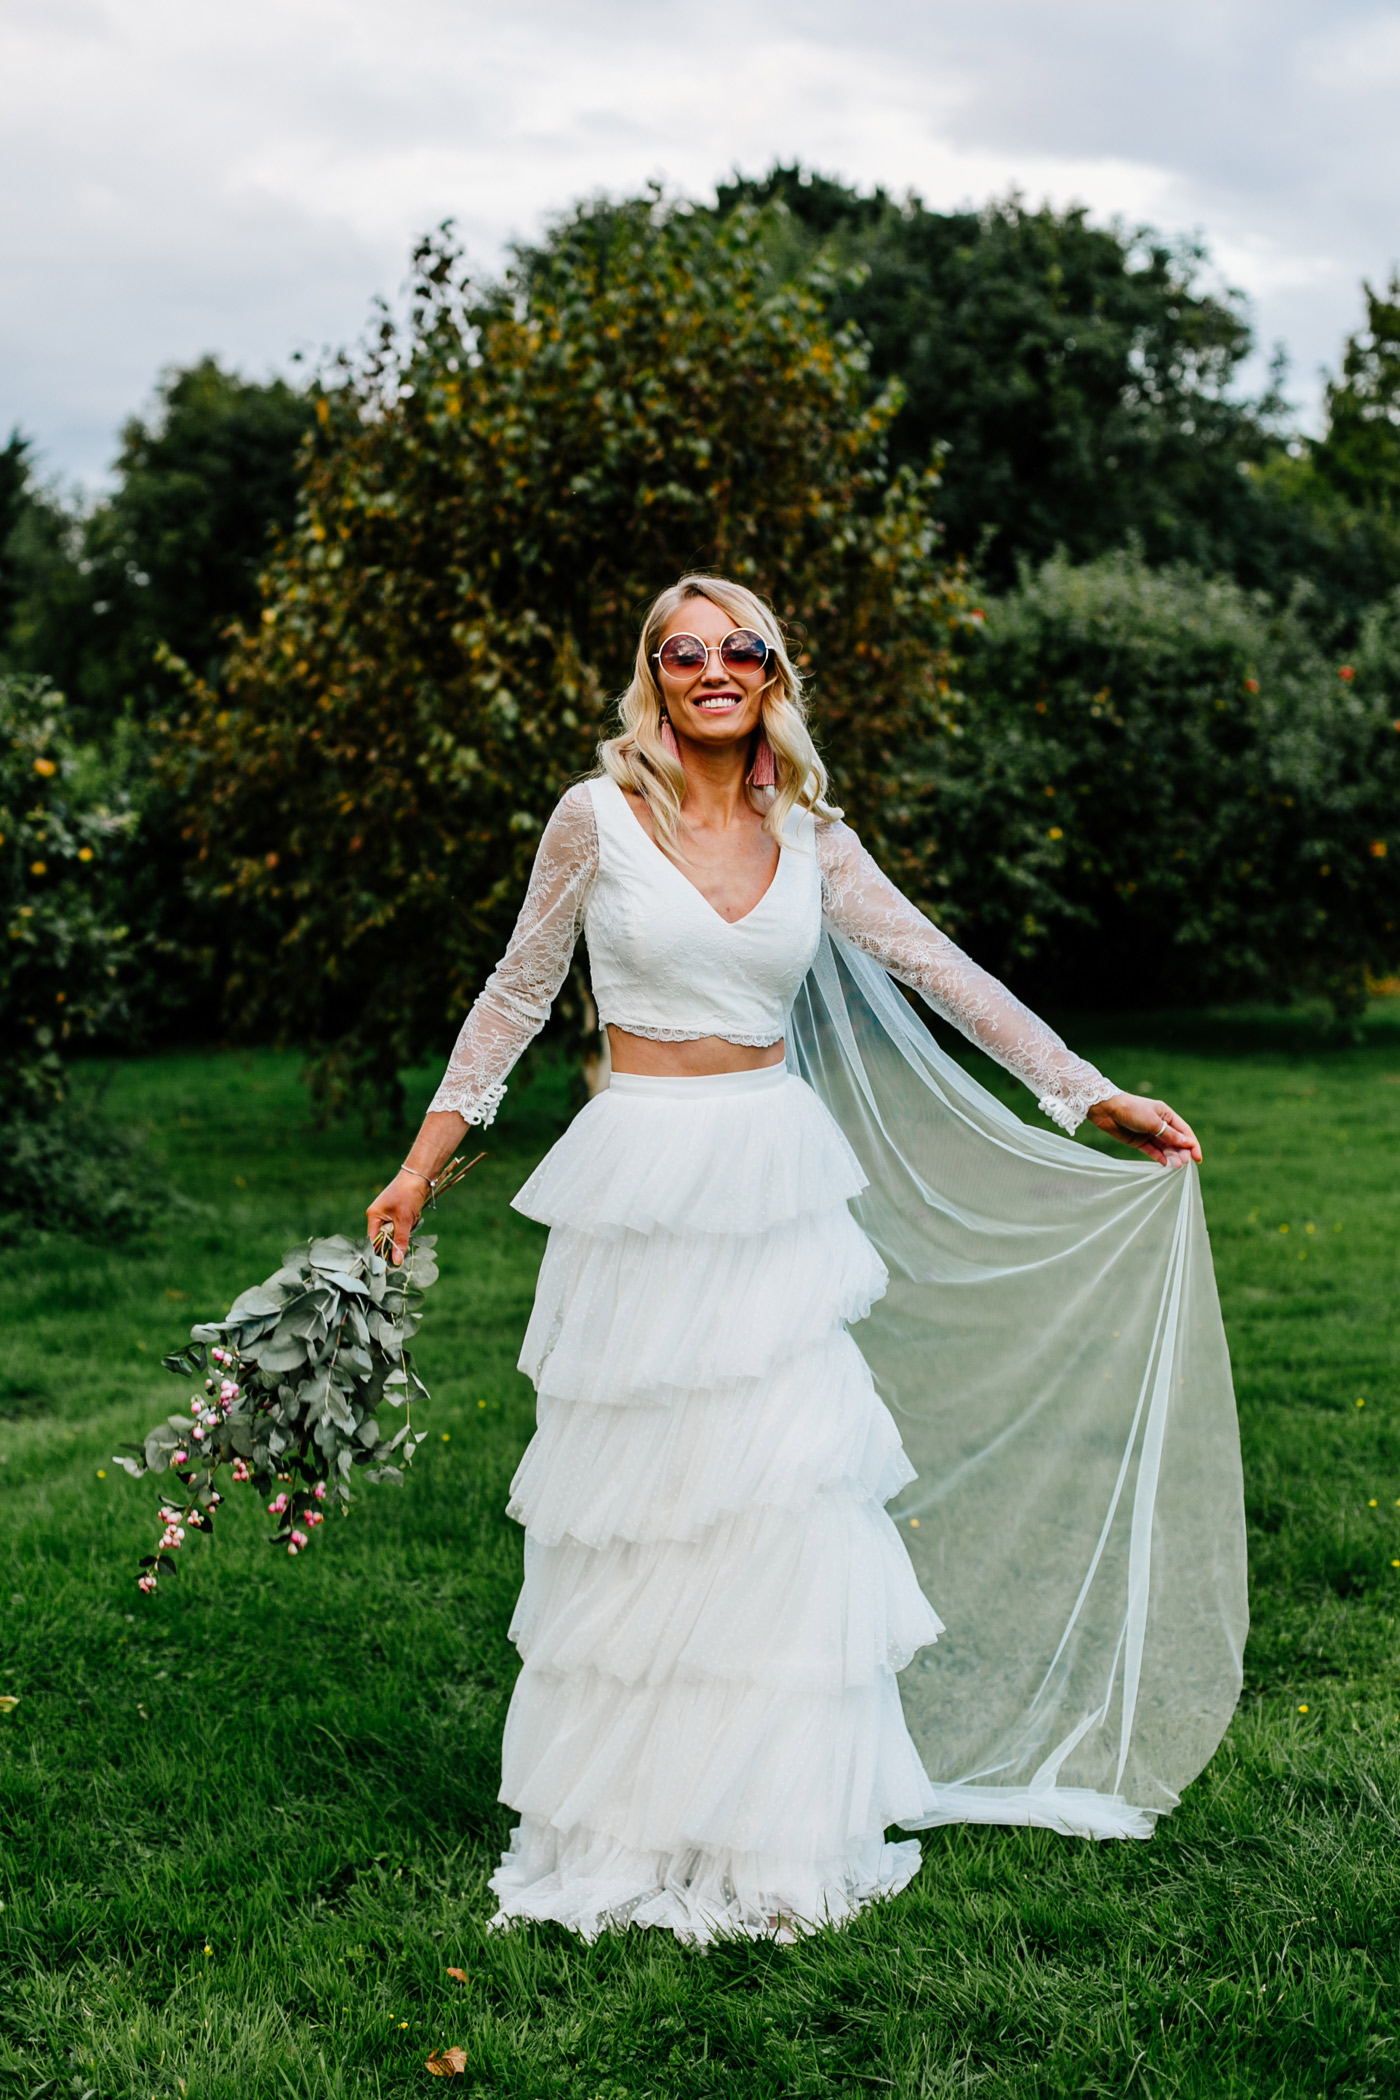 KENT-ELOPEMENT-wedding-photographer-UK-London-Epic-Love-Story-008